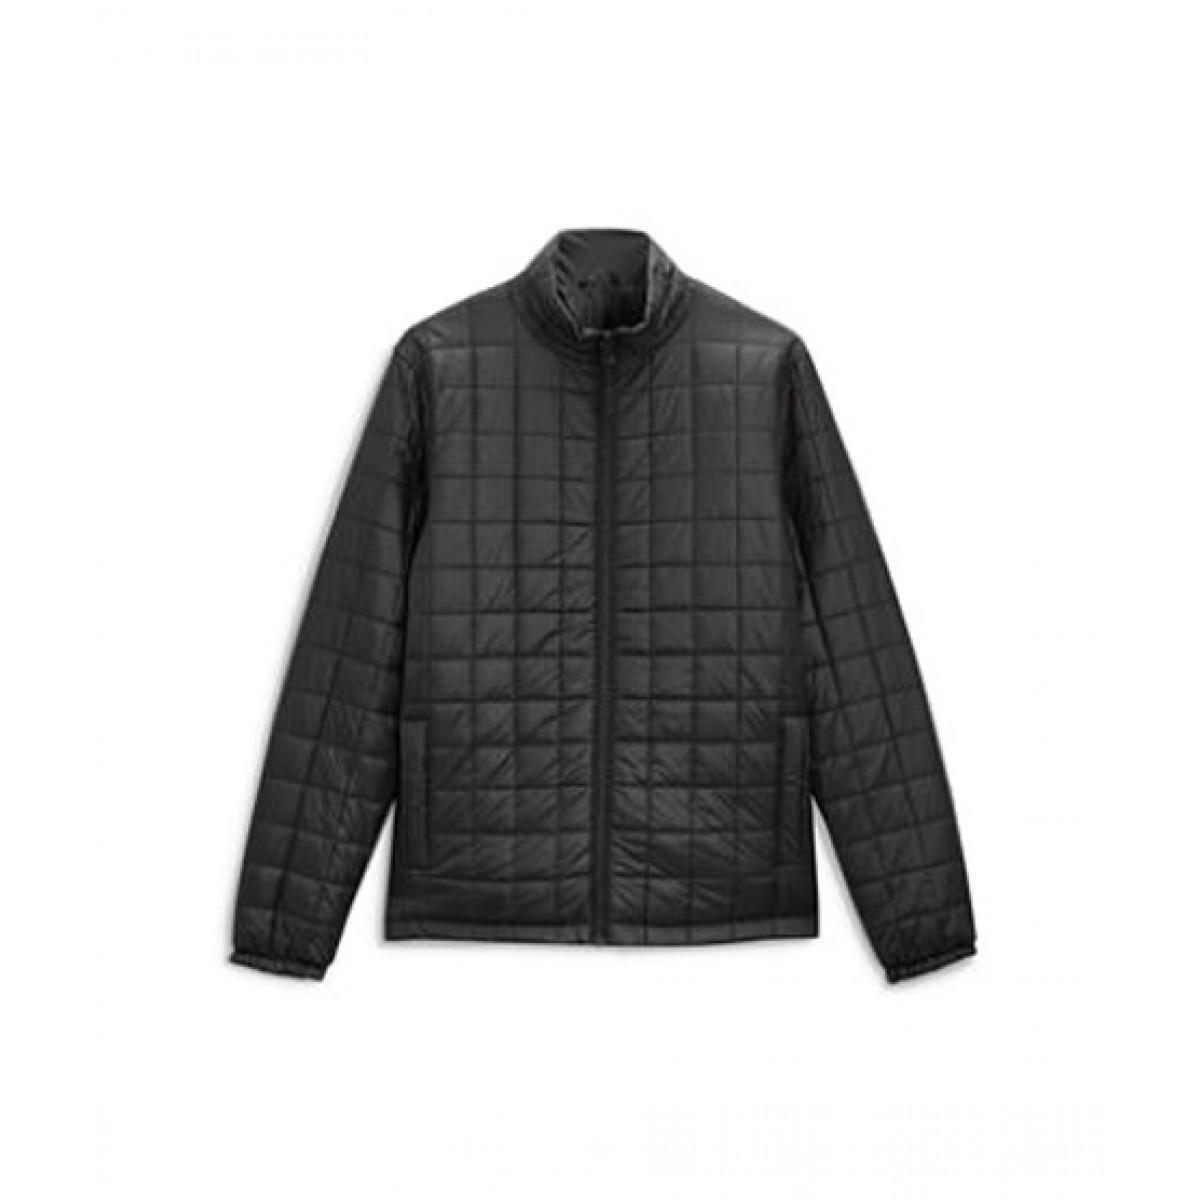 mens jackets next